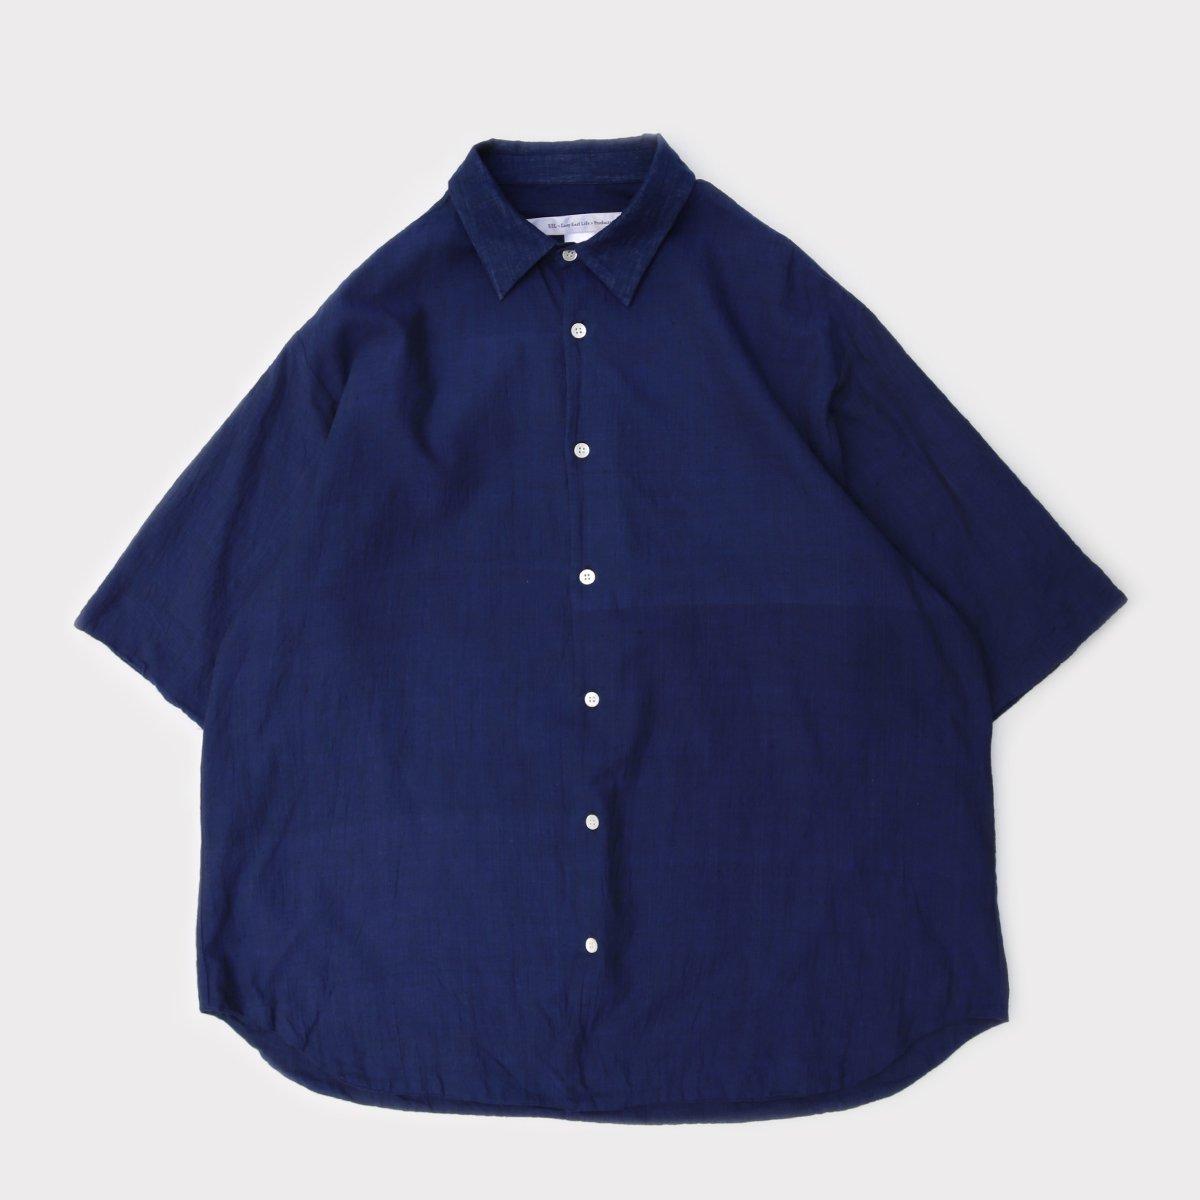 Merci Shirt Khadi Ver. Navy